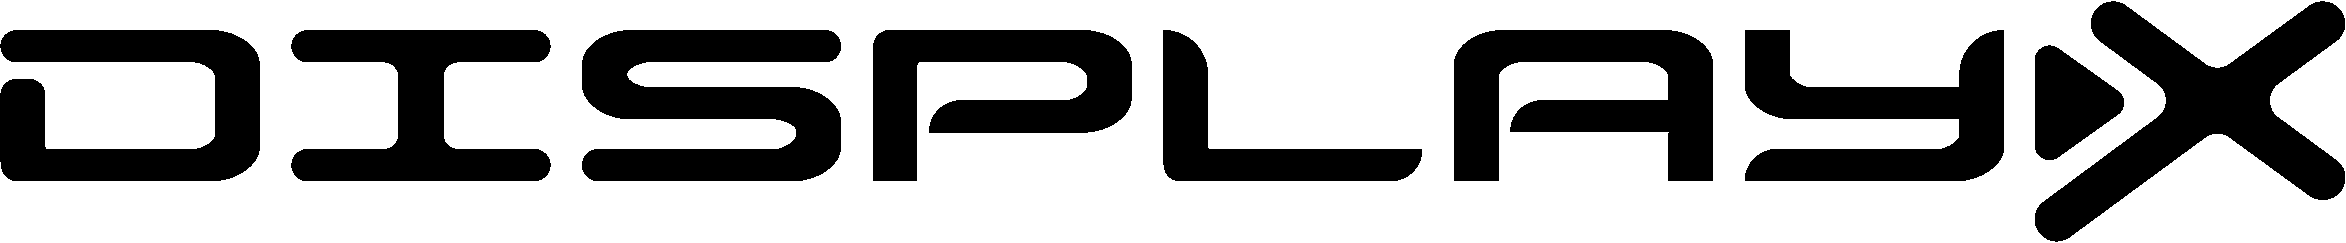 DisplayX